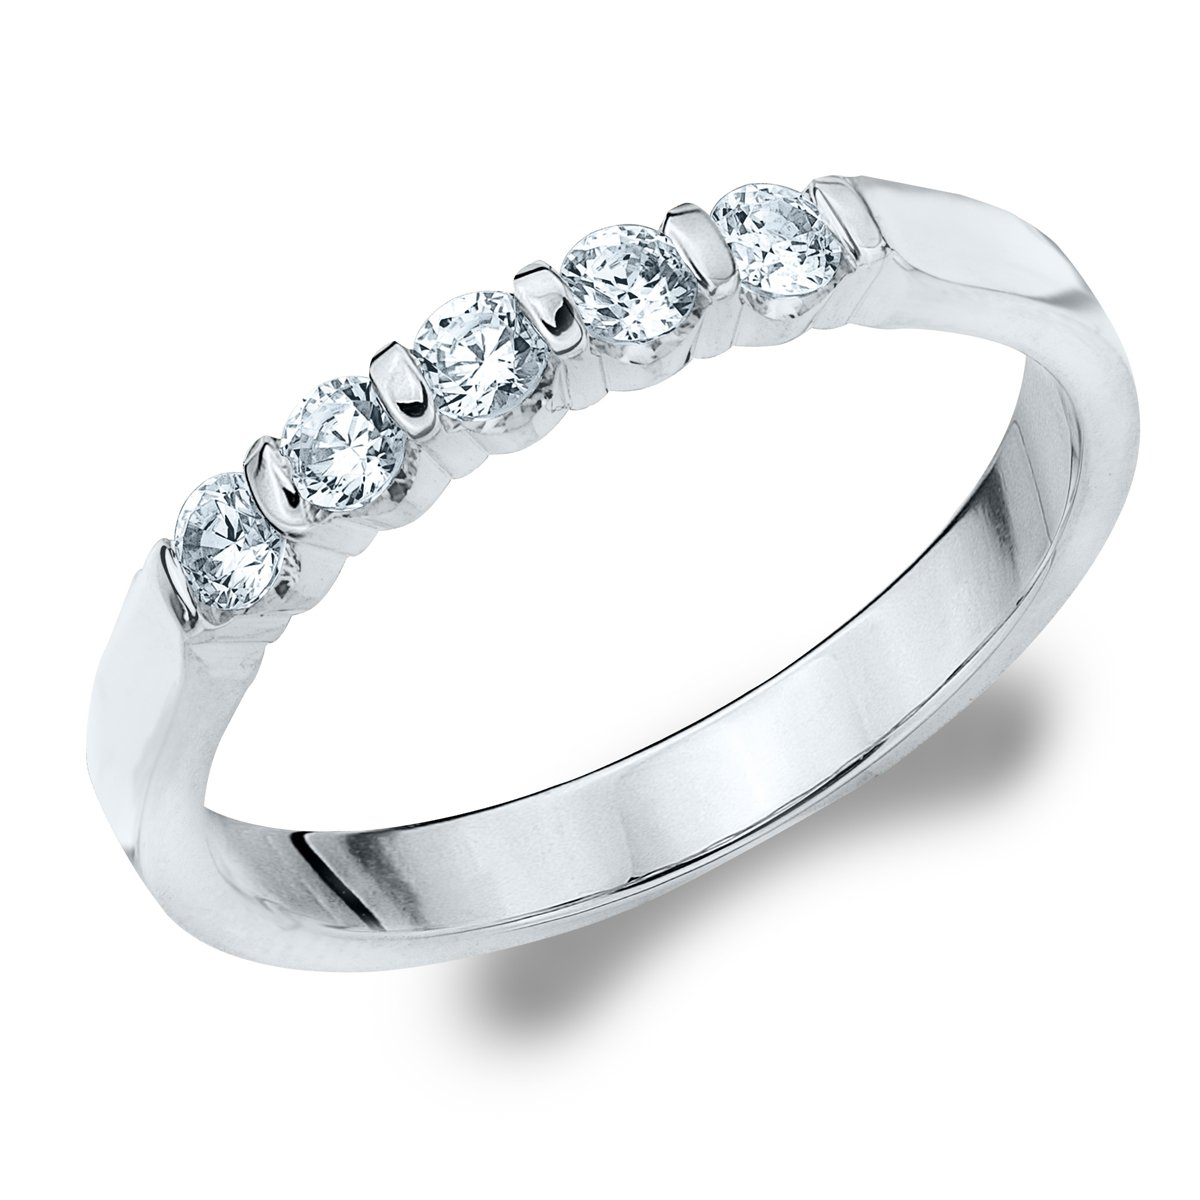 5 Stone Diamond Ring for Women.25 CT in 10K Gold, 5 Stone Diamond Wedding Anniversary Band